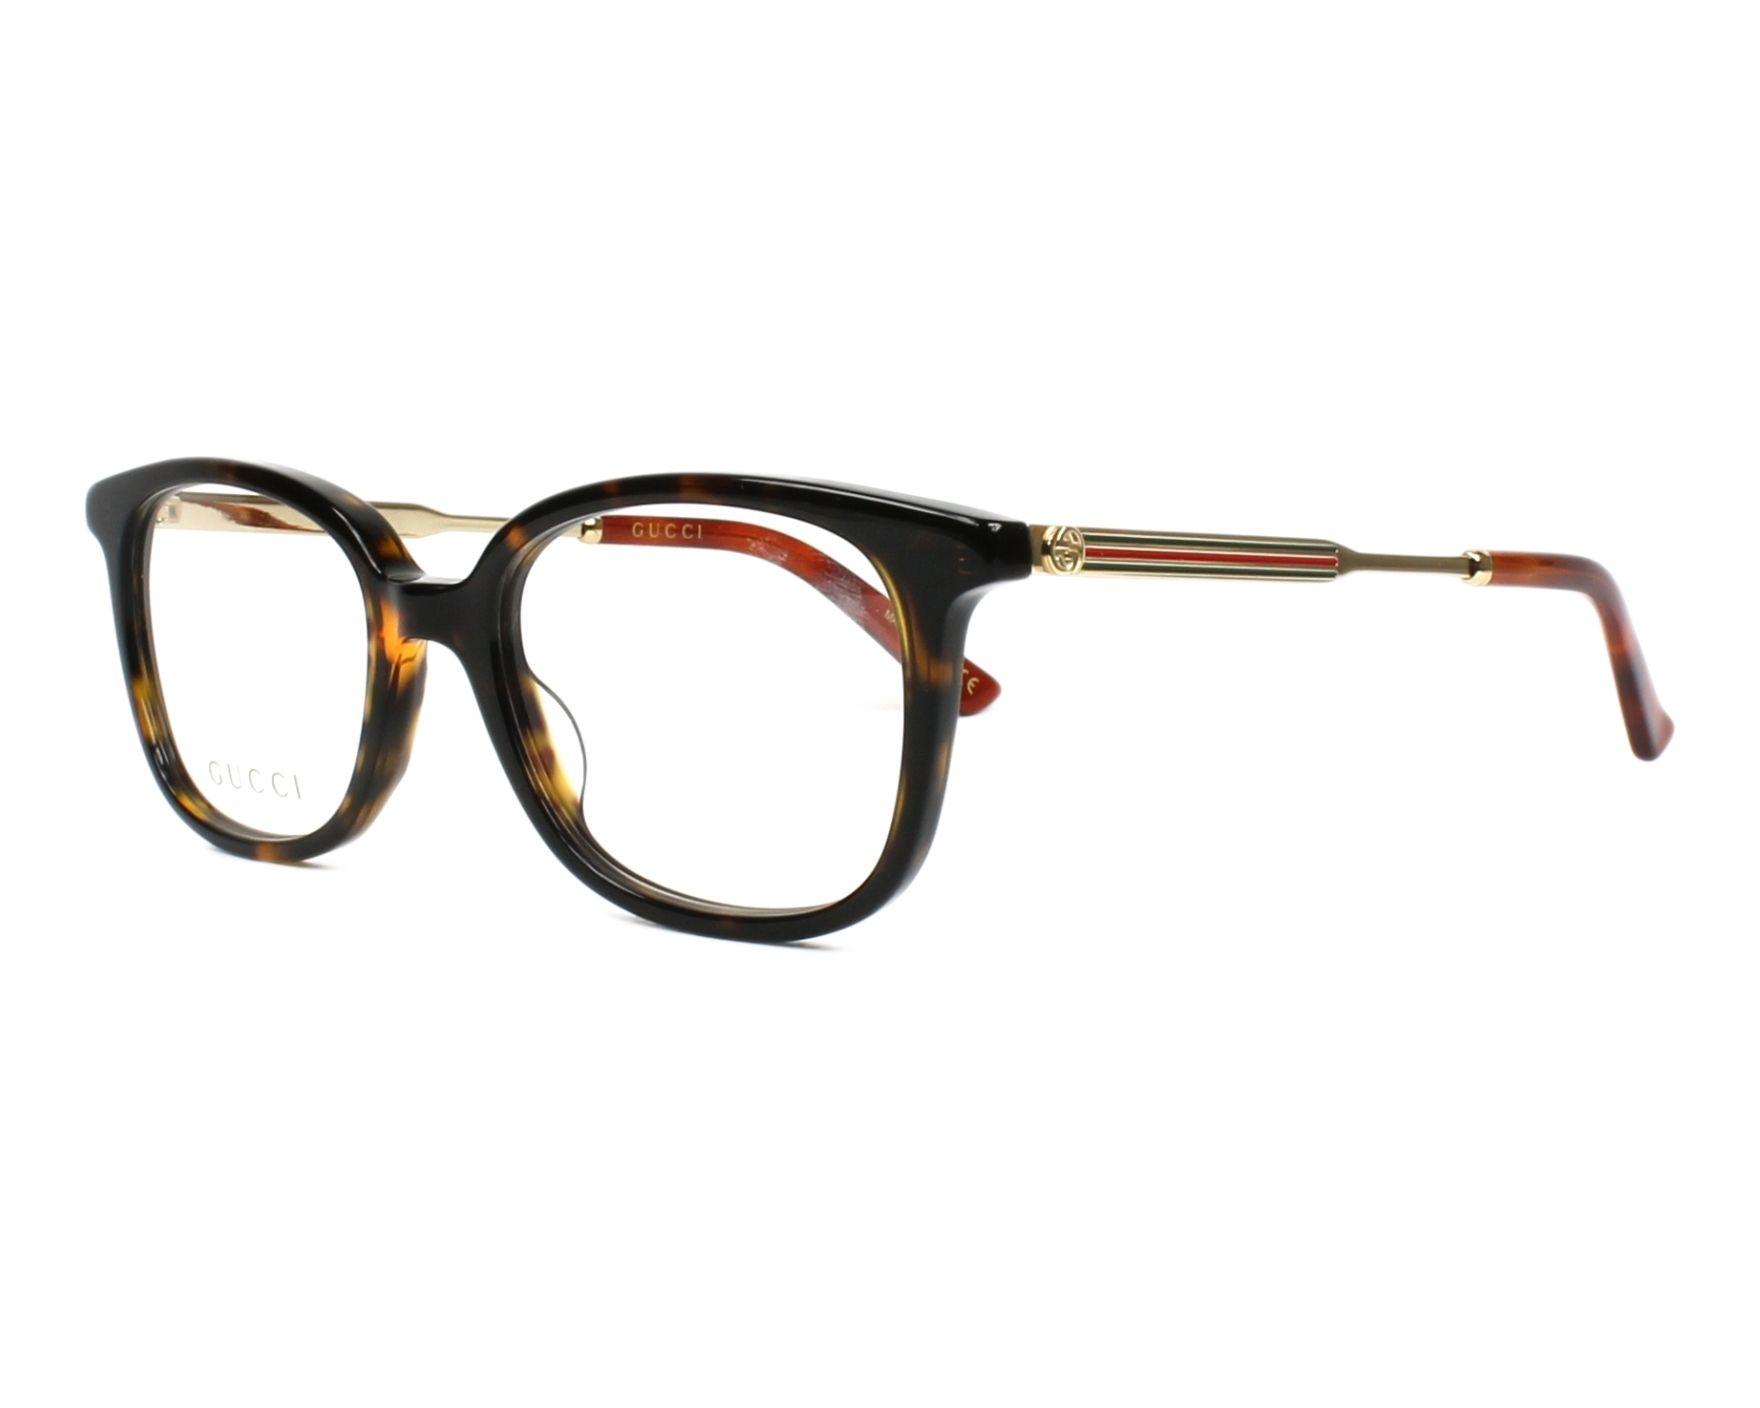 fb53629617d7 eyeglasses Gucci GG-0202-O 002 50-18 Havana Gold profile view